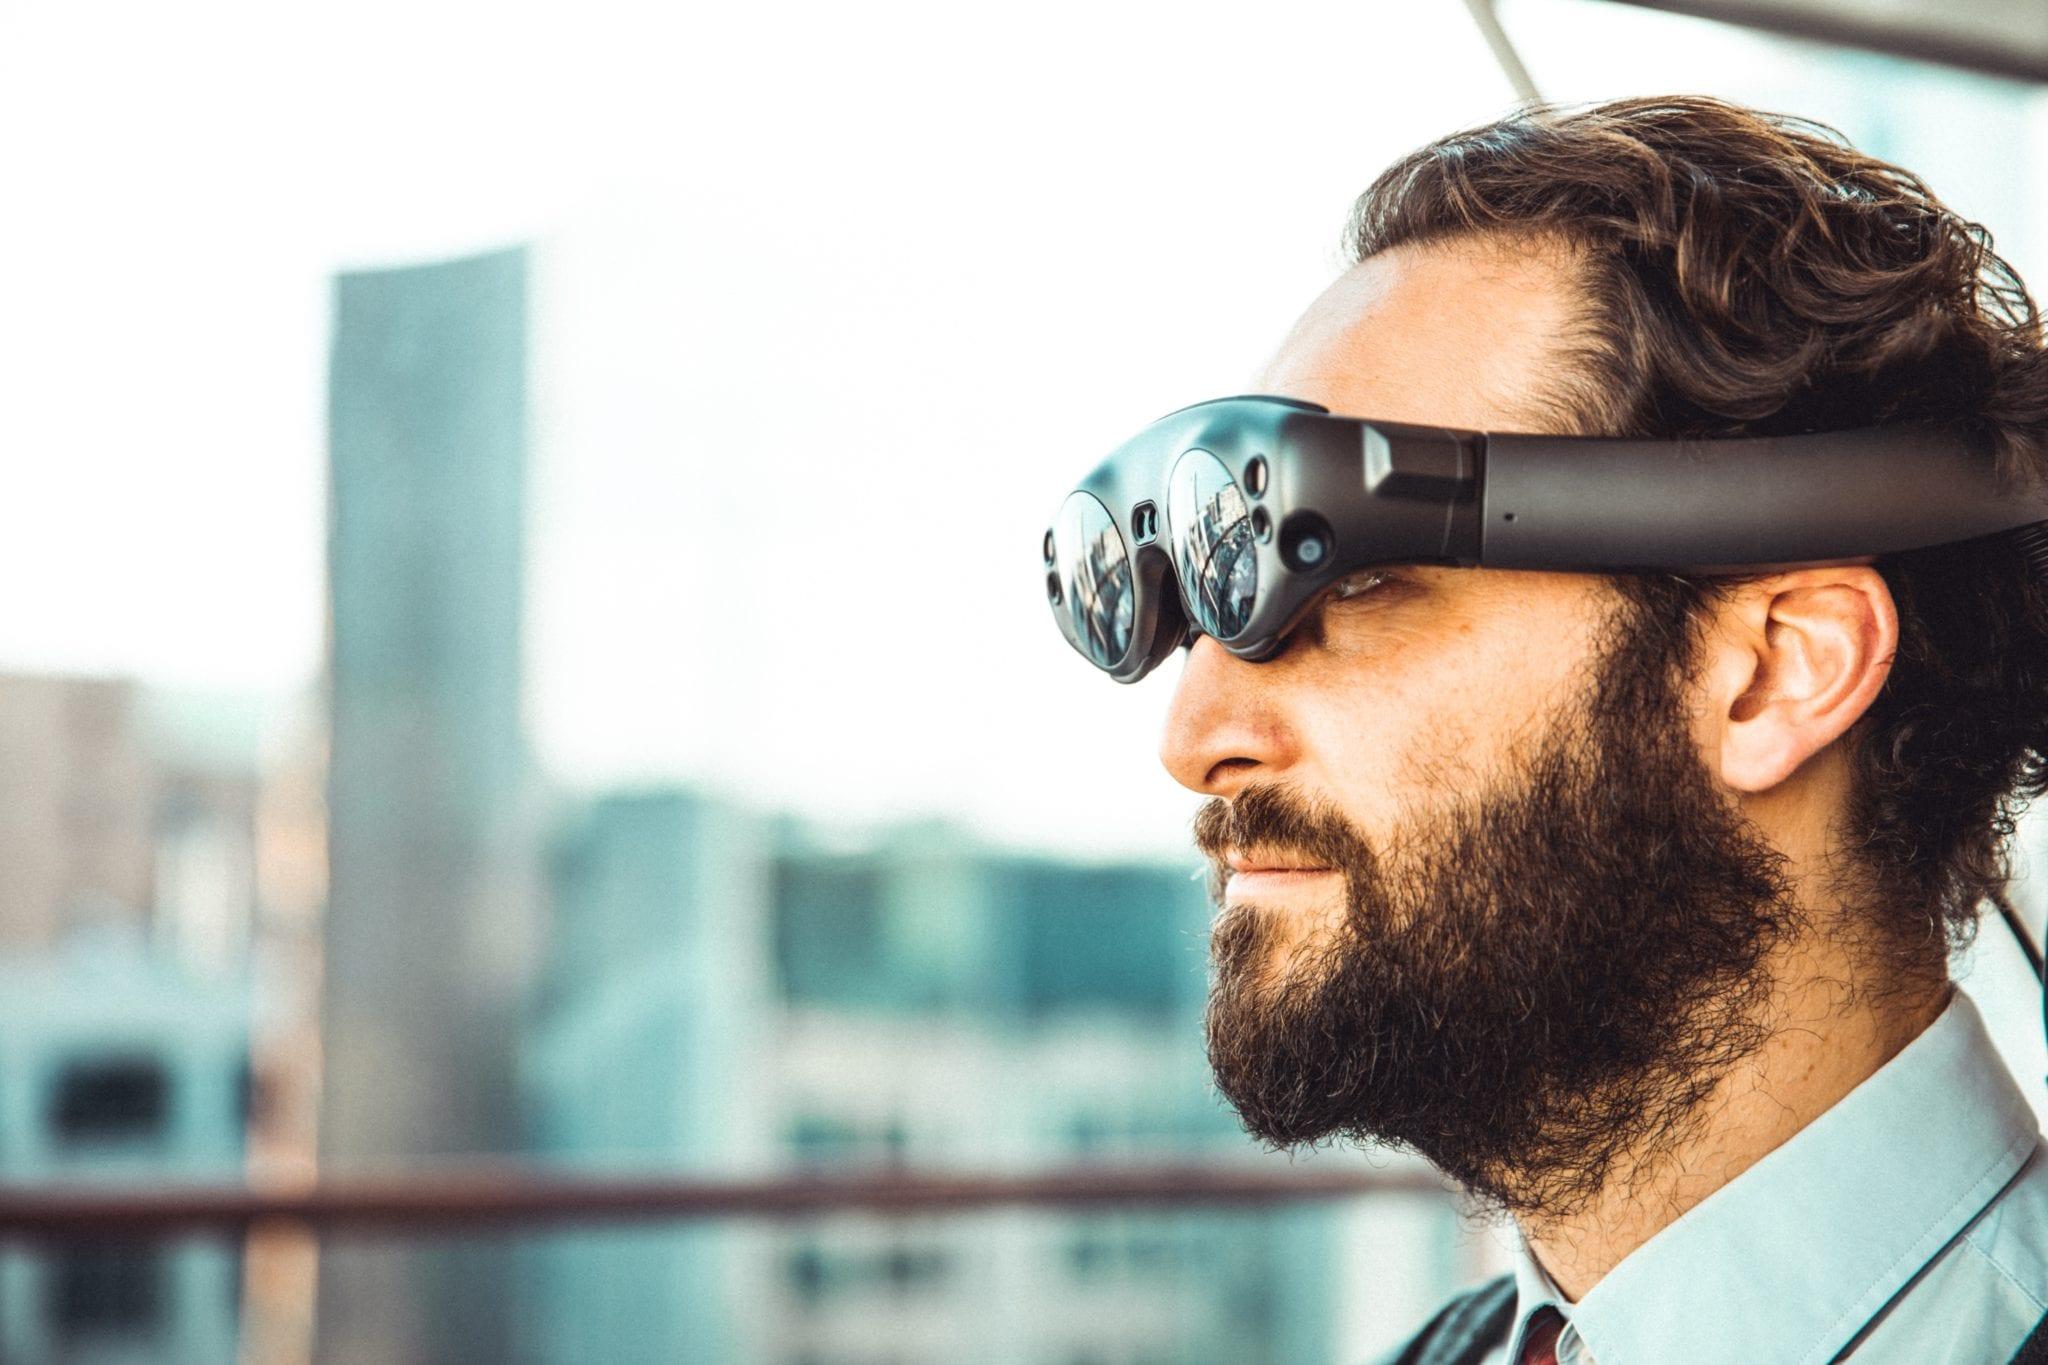 jumpcon panel - virtual reality glasses